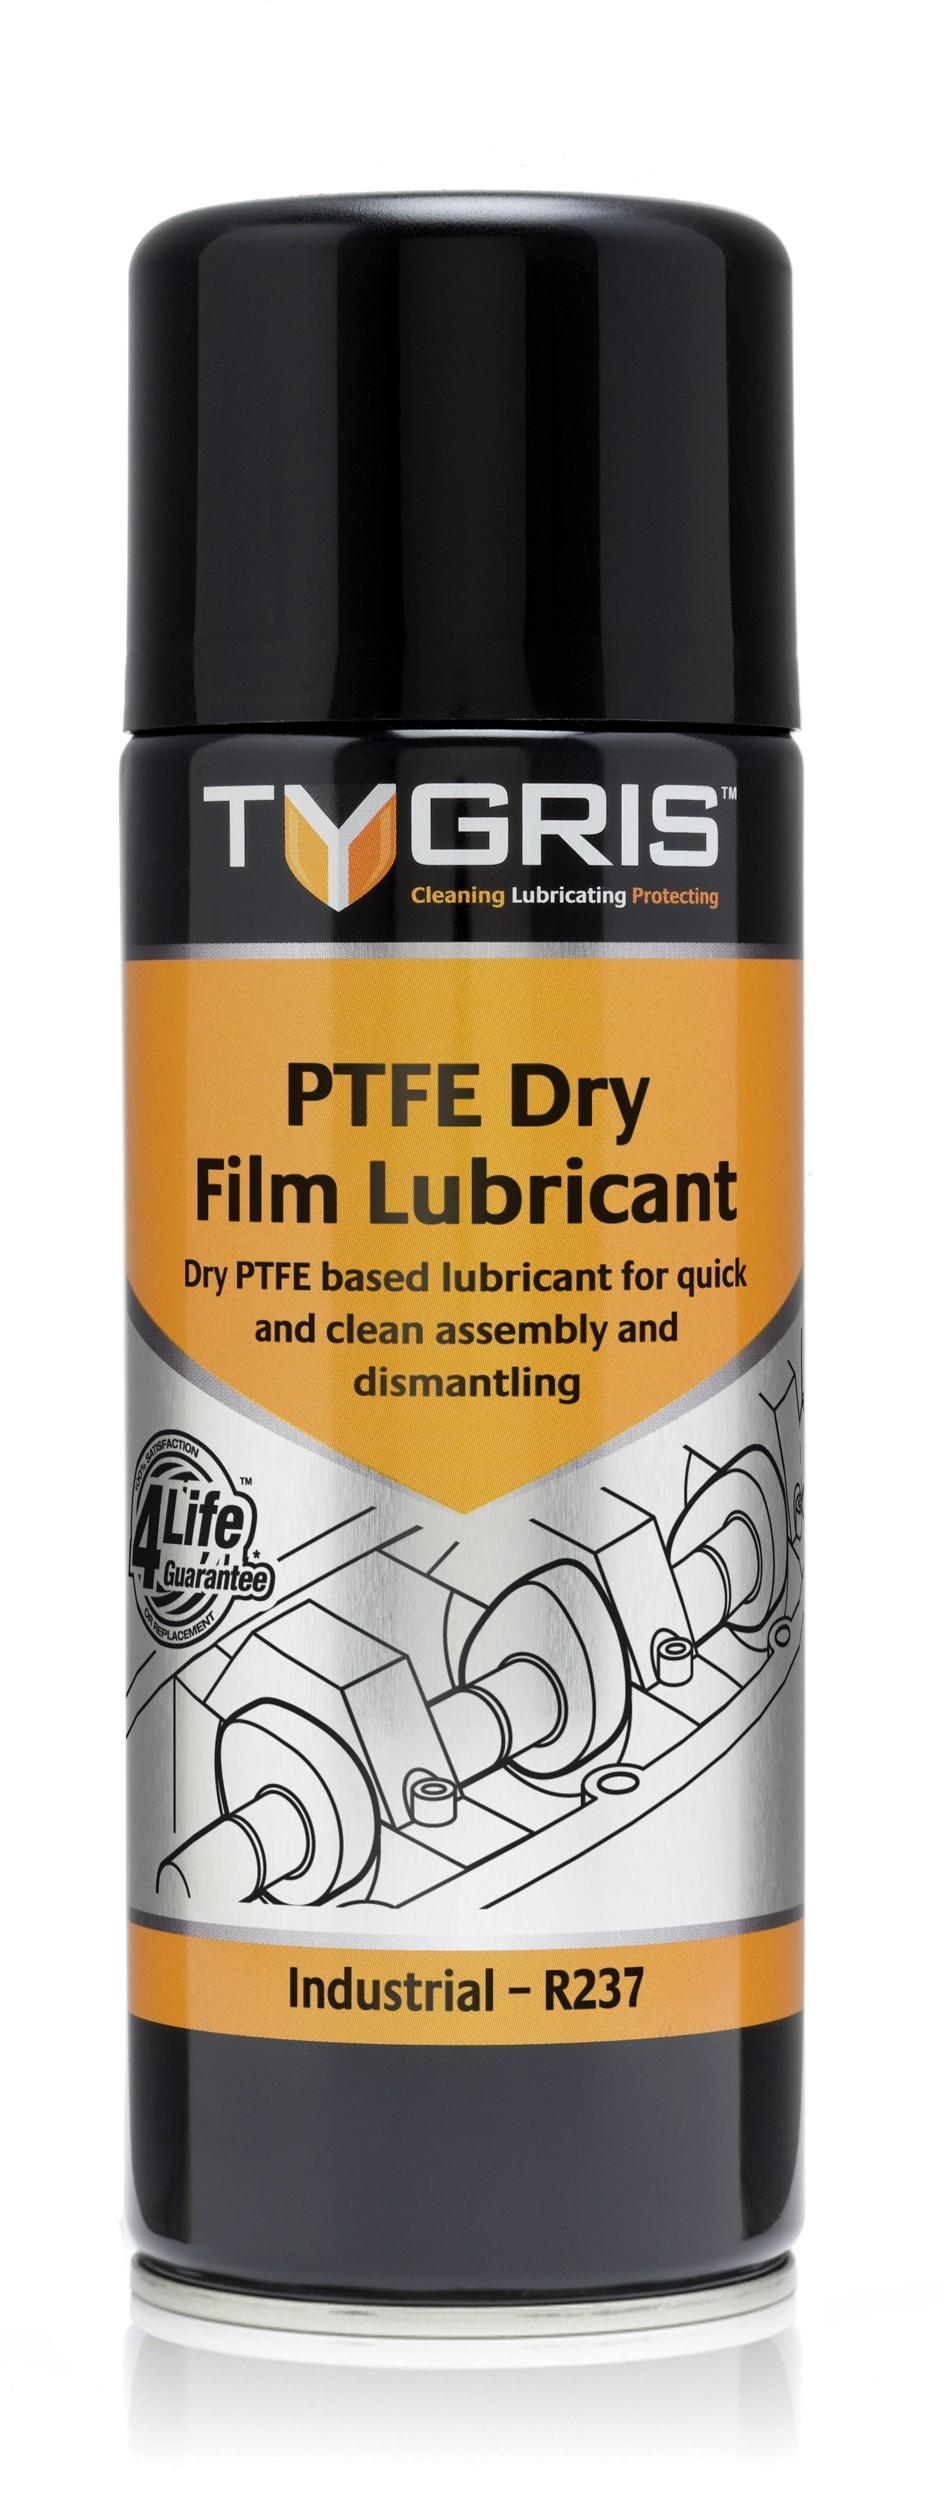 R237 PTFE Dry Film Lubricant 400ml